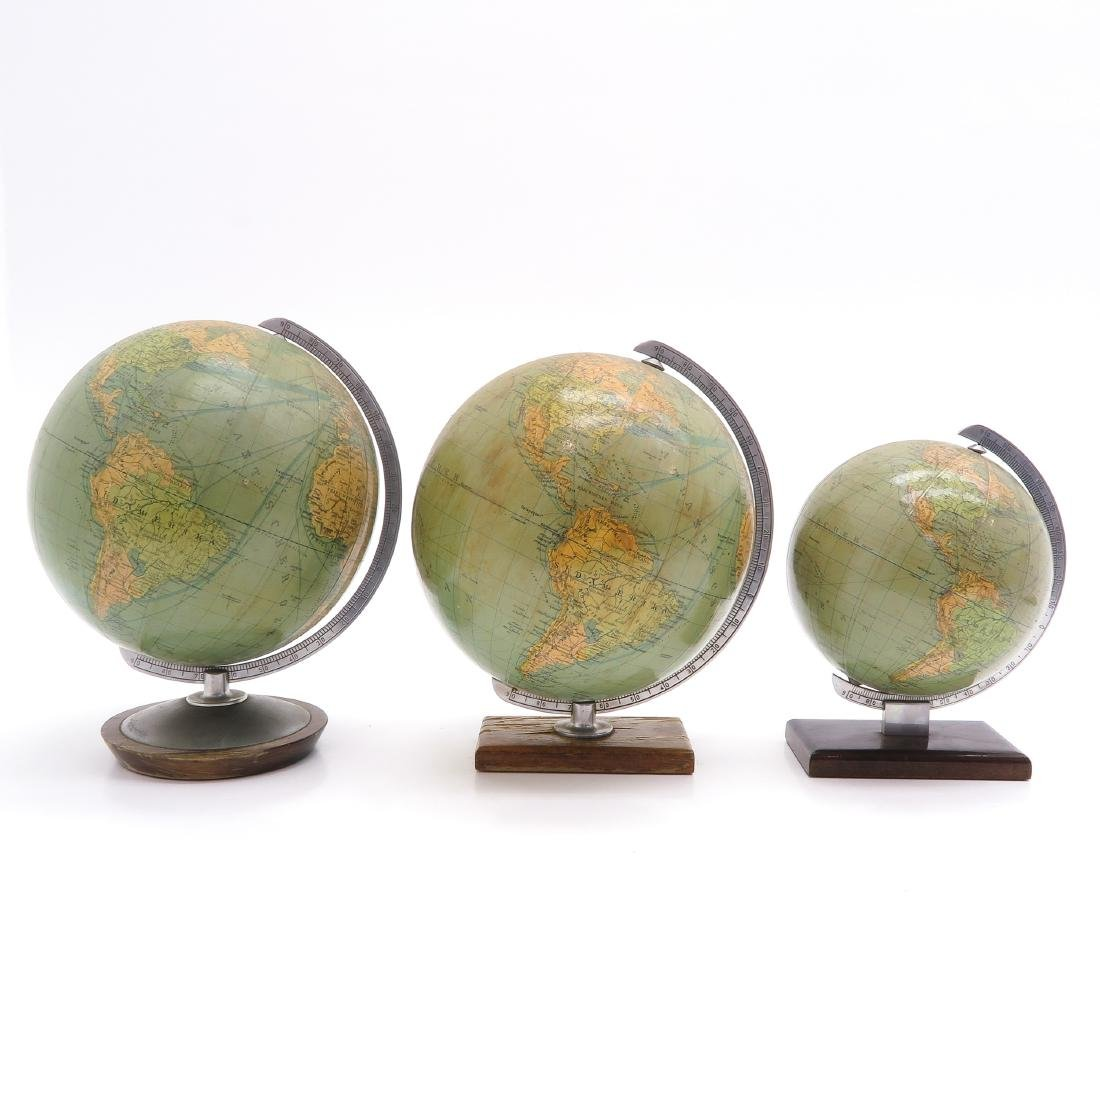 A Lot of 3 Columbus Erdglobus Globes - 3